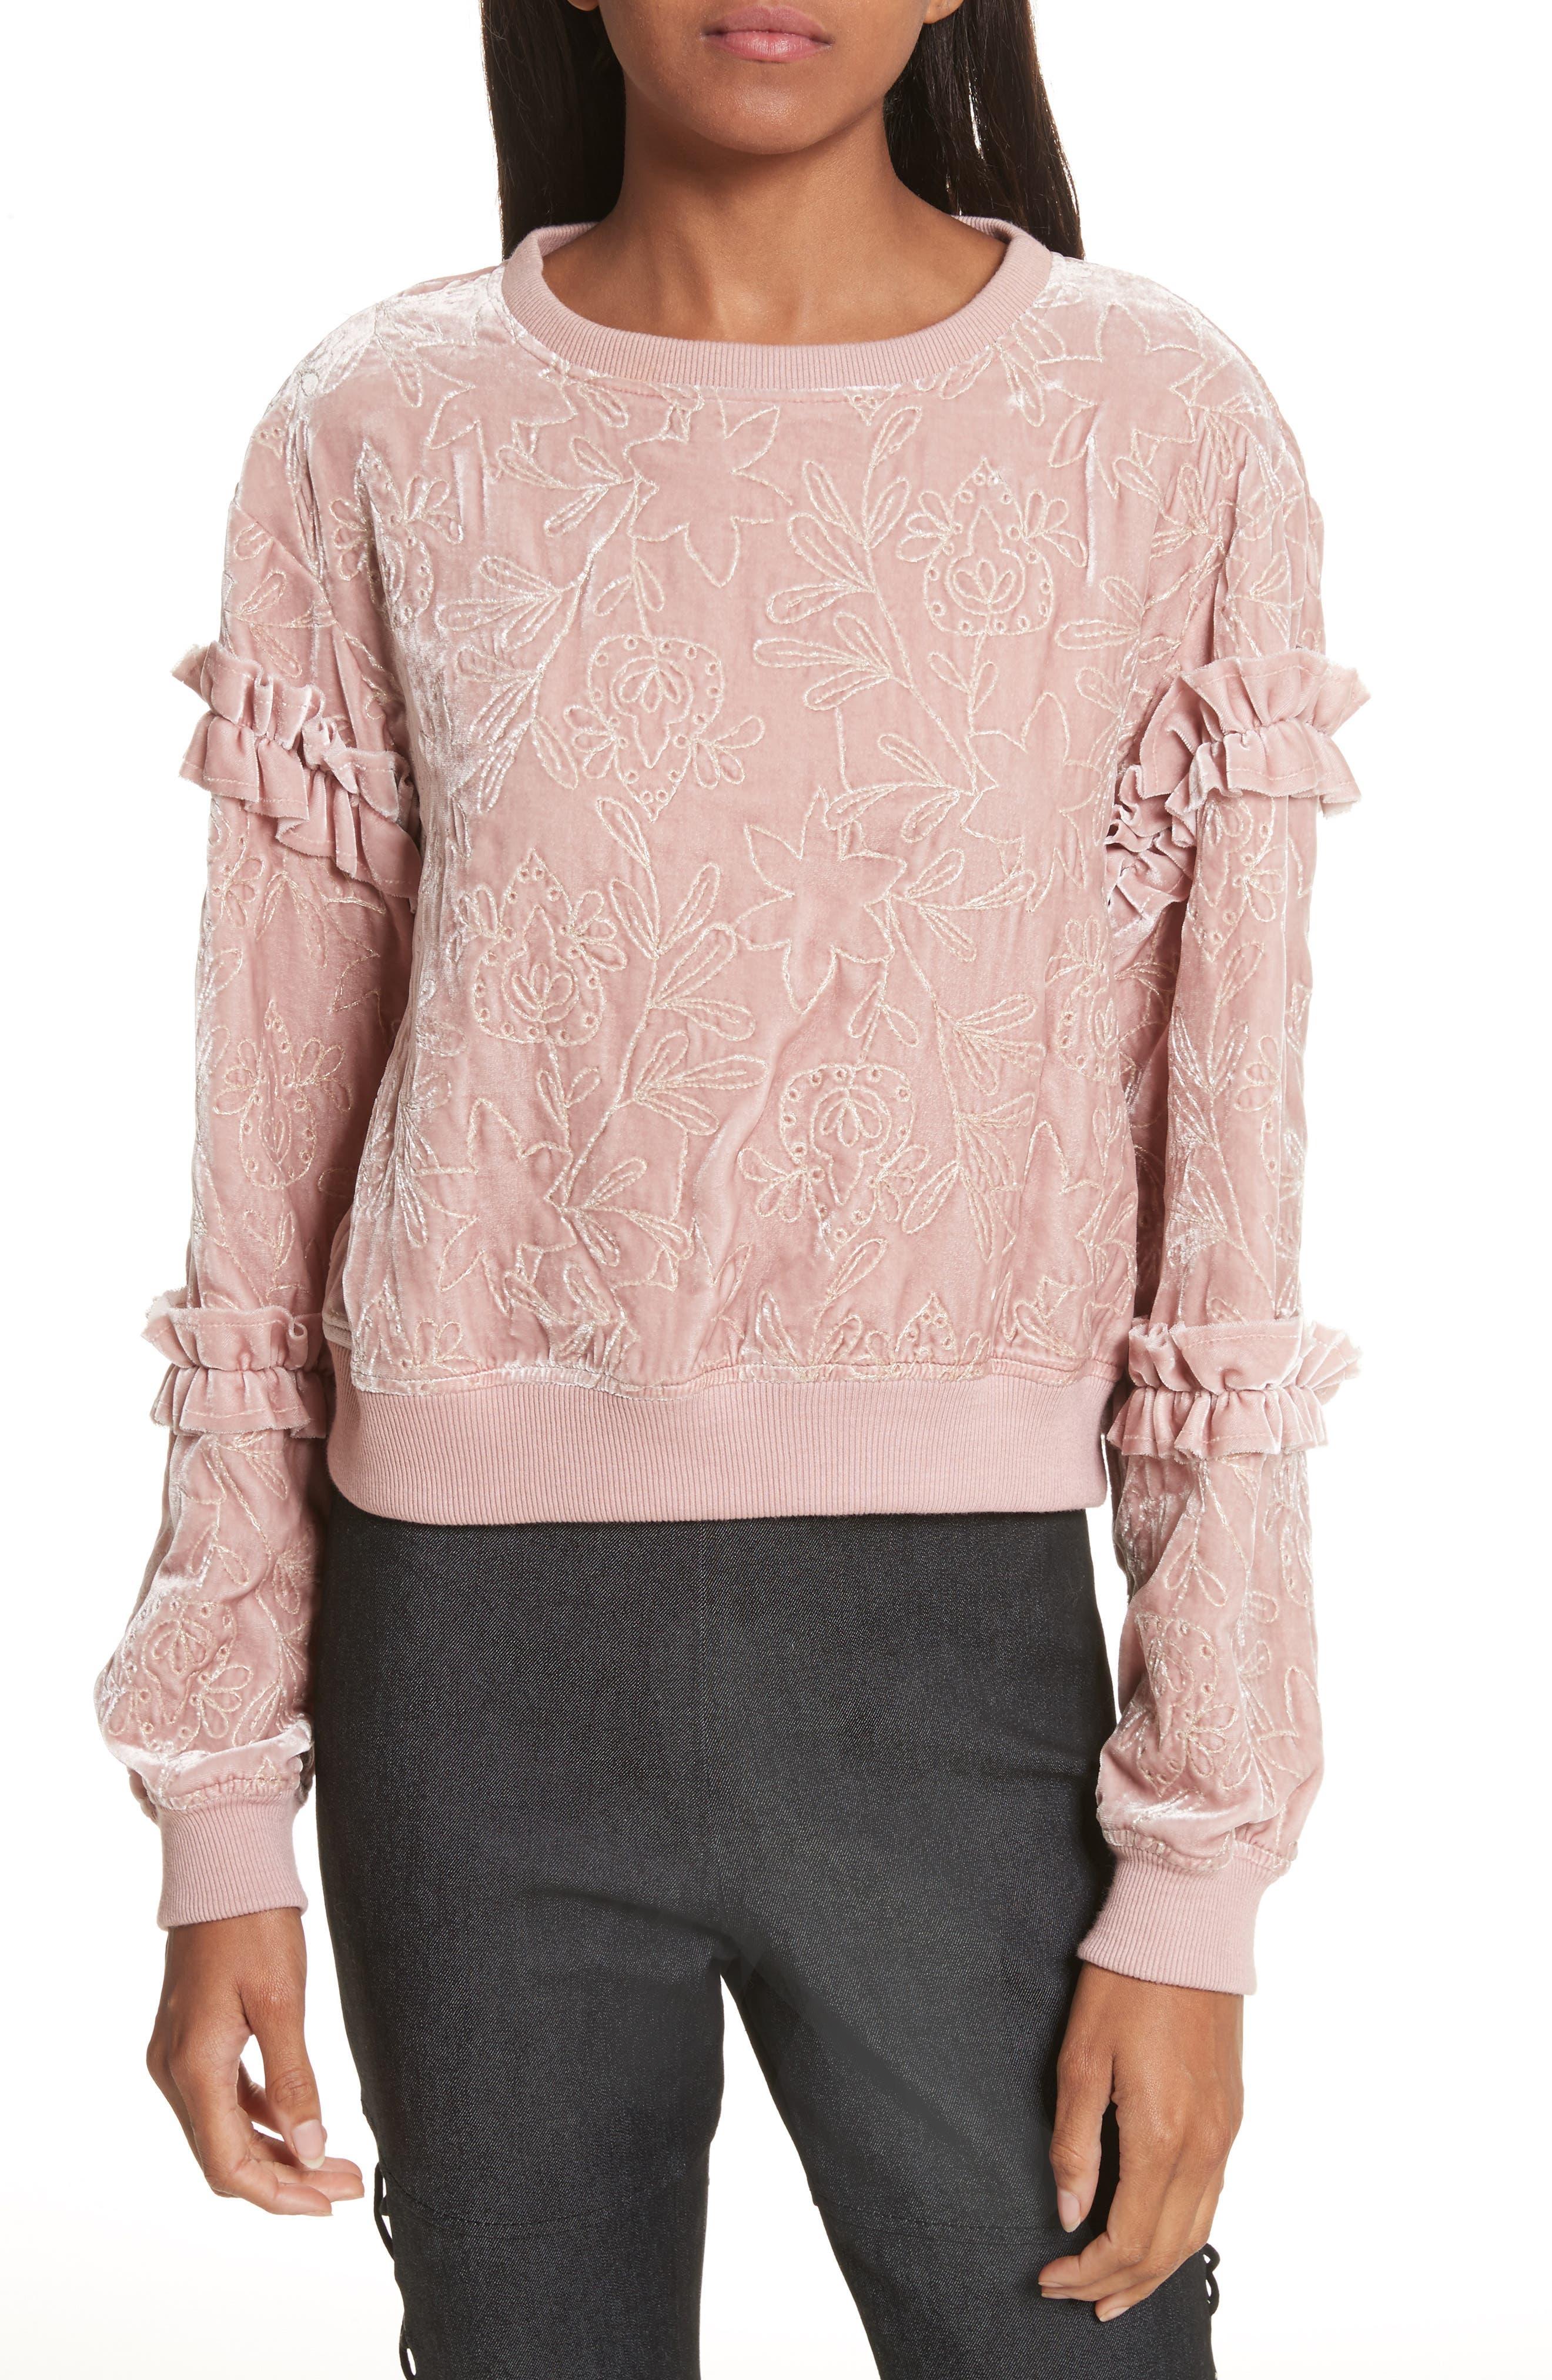 Nara Embroidered Velvet Sweatshirt,                             Main thumbnail 1, color,                             563